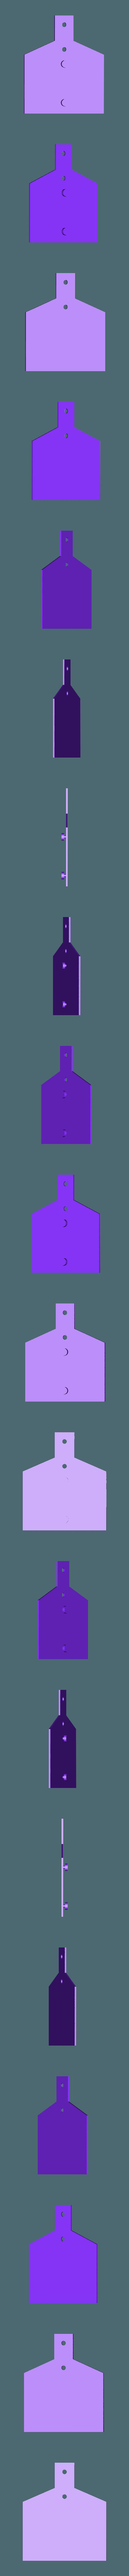 CR-10_Mount_for_Pi_B%2B_Stock_Case.stl Download free STL file CR-10 Control Box Mount for the stock Pi B+ case • 3D printer design, ibgeek